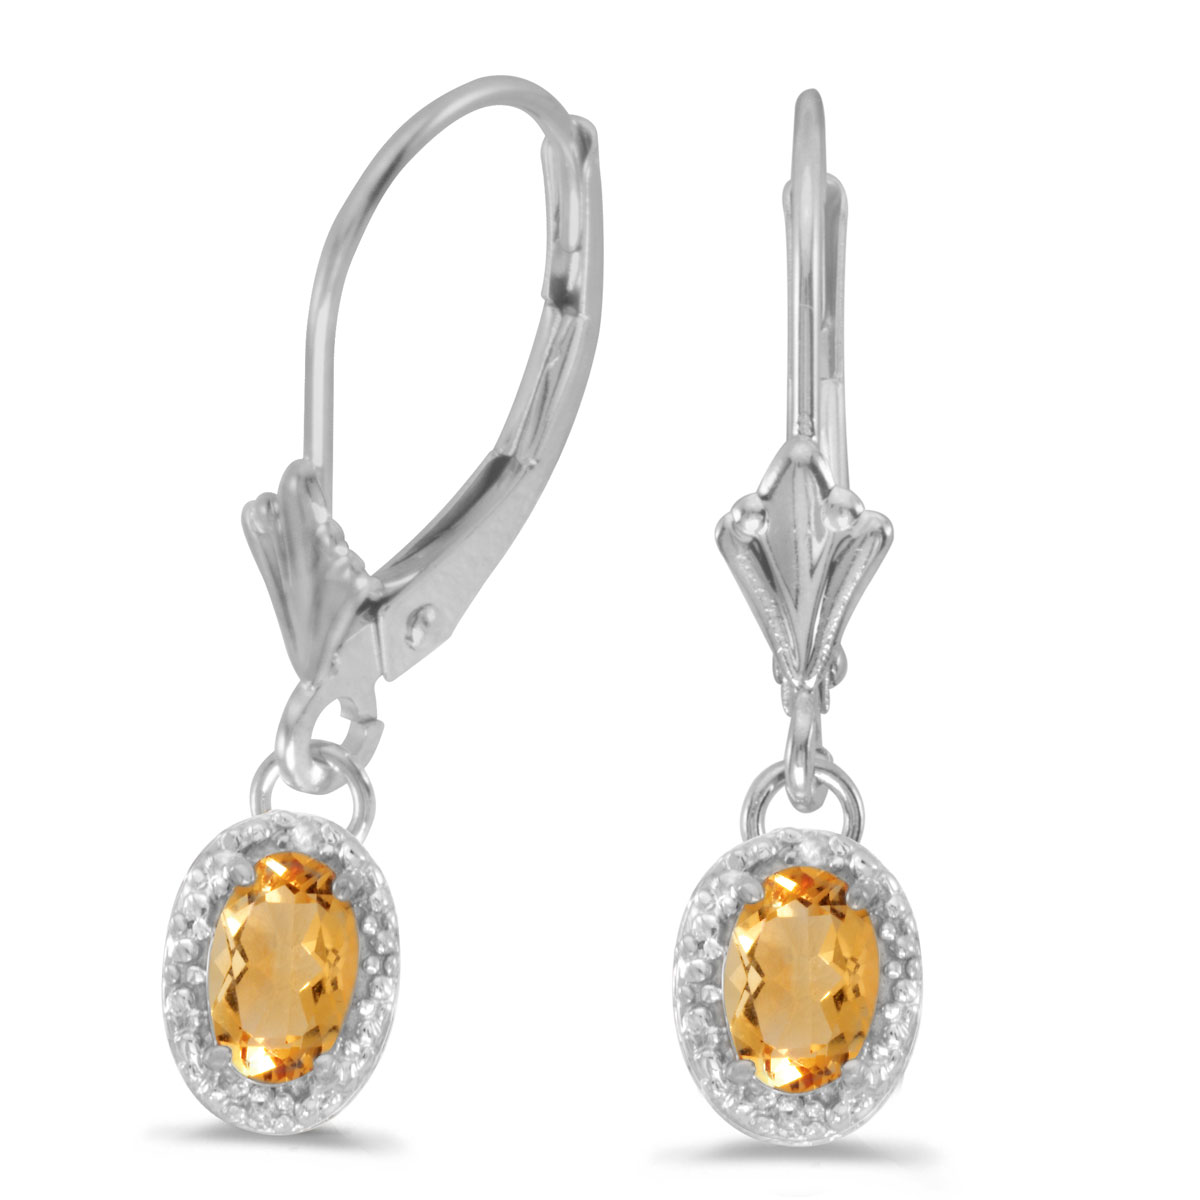 14k White Gold Oval Citrine And Diamond Leverback Earrings